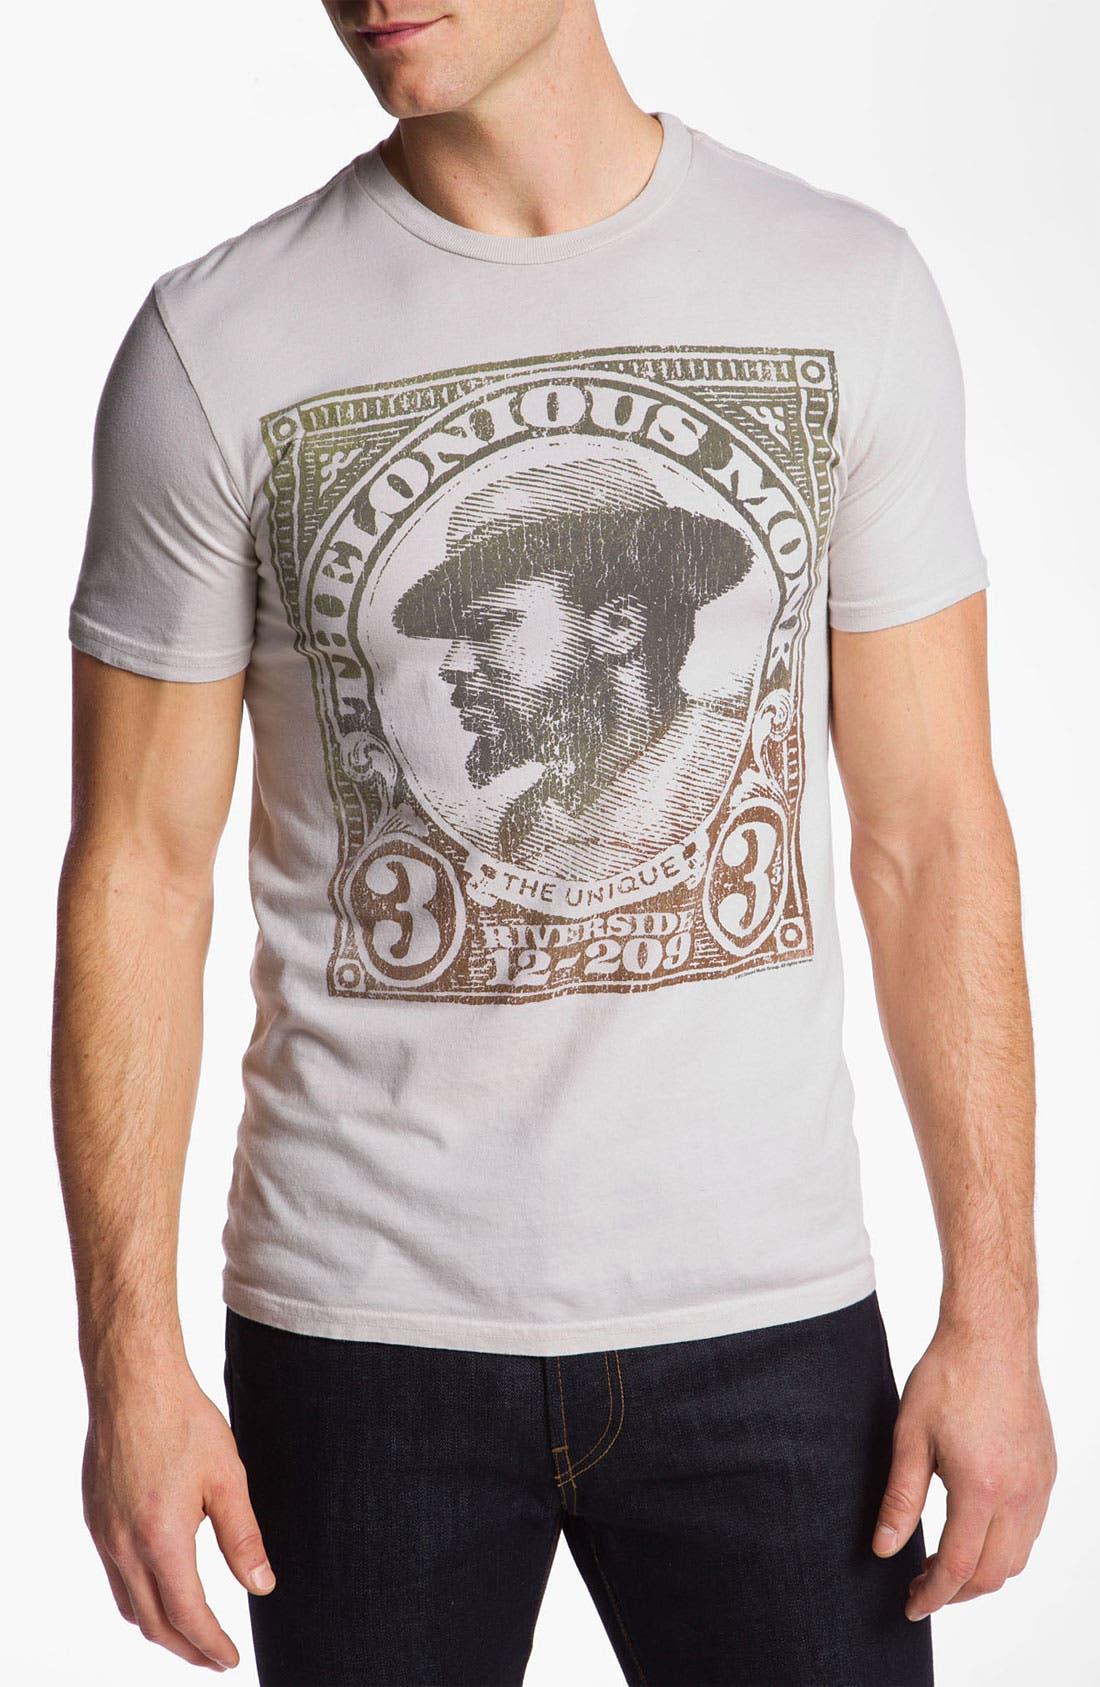 Main Image - Chaser 'The Unique Thelonius Monk' Crewneck T-Shirt